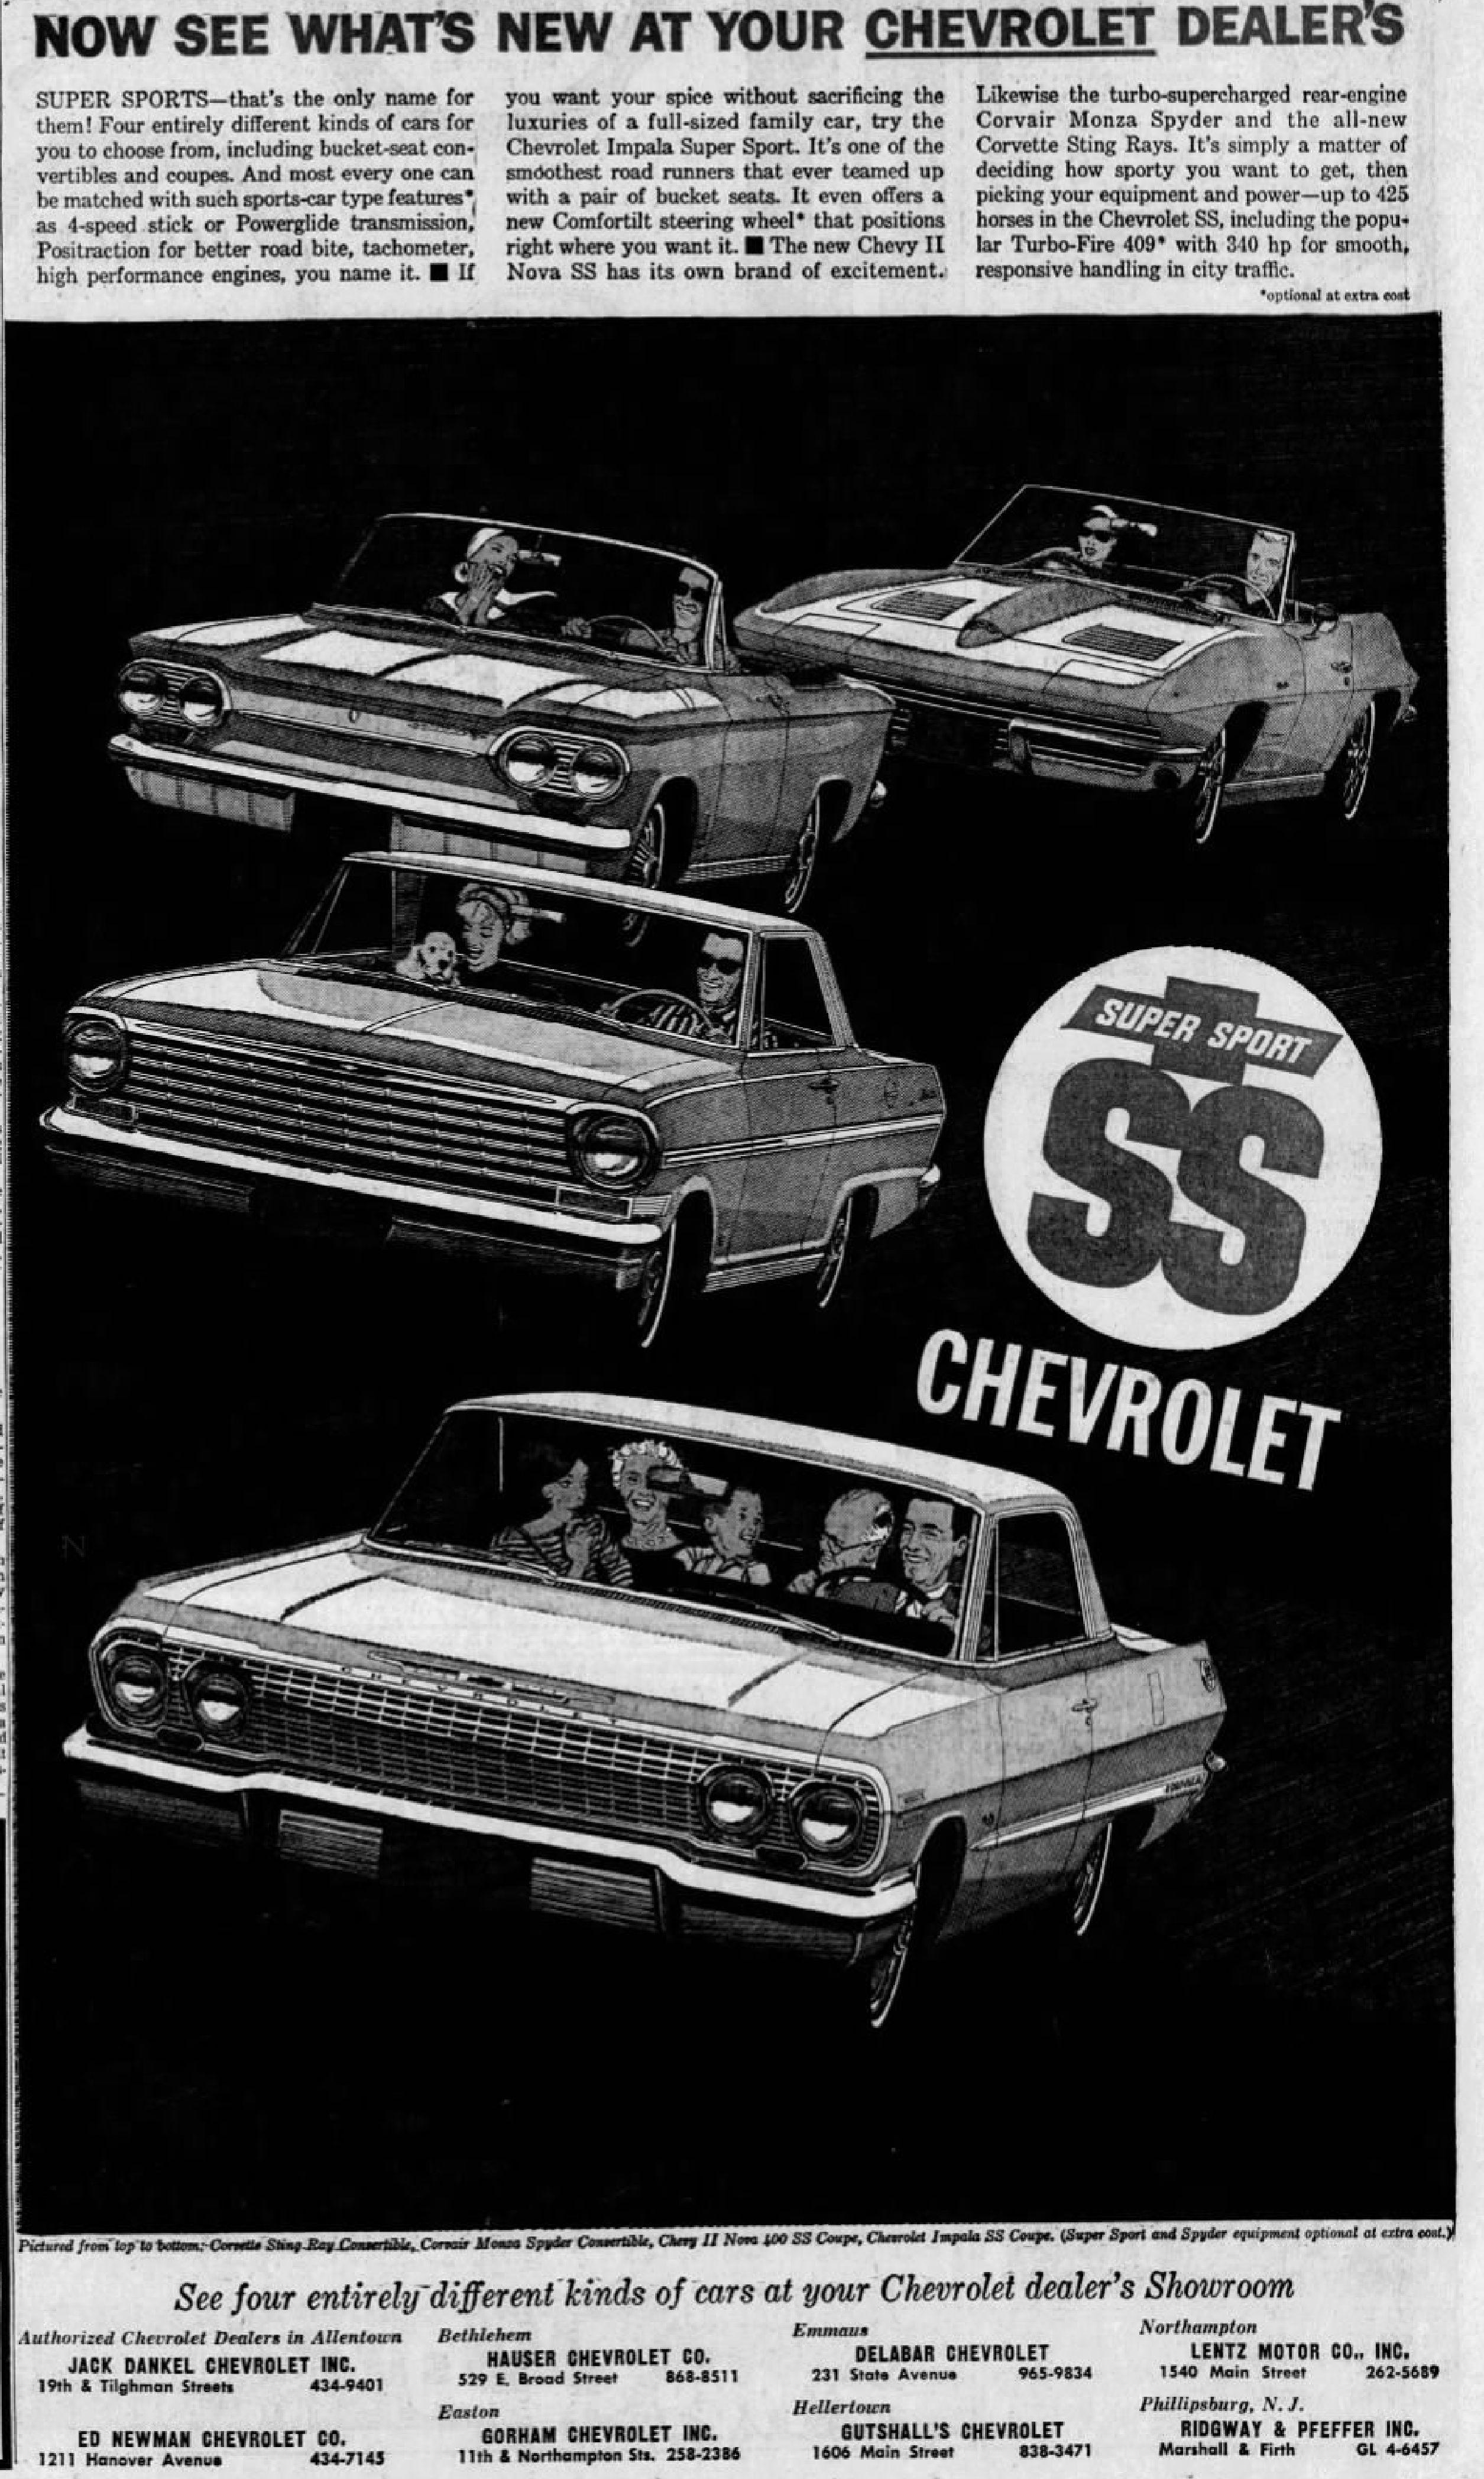 File:1963 - Dankel - Ed Newman Chevrolet - 1 Mar MC - Allentown PA.jpg -  Wikimedia Commons